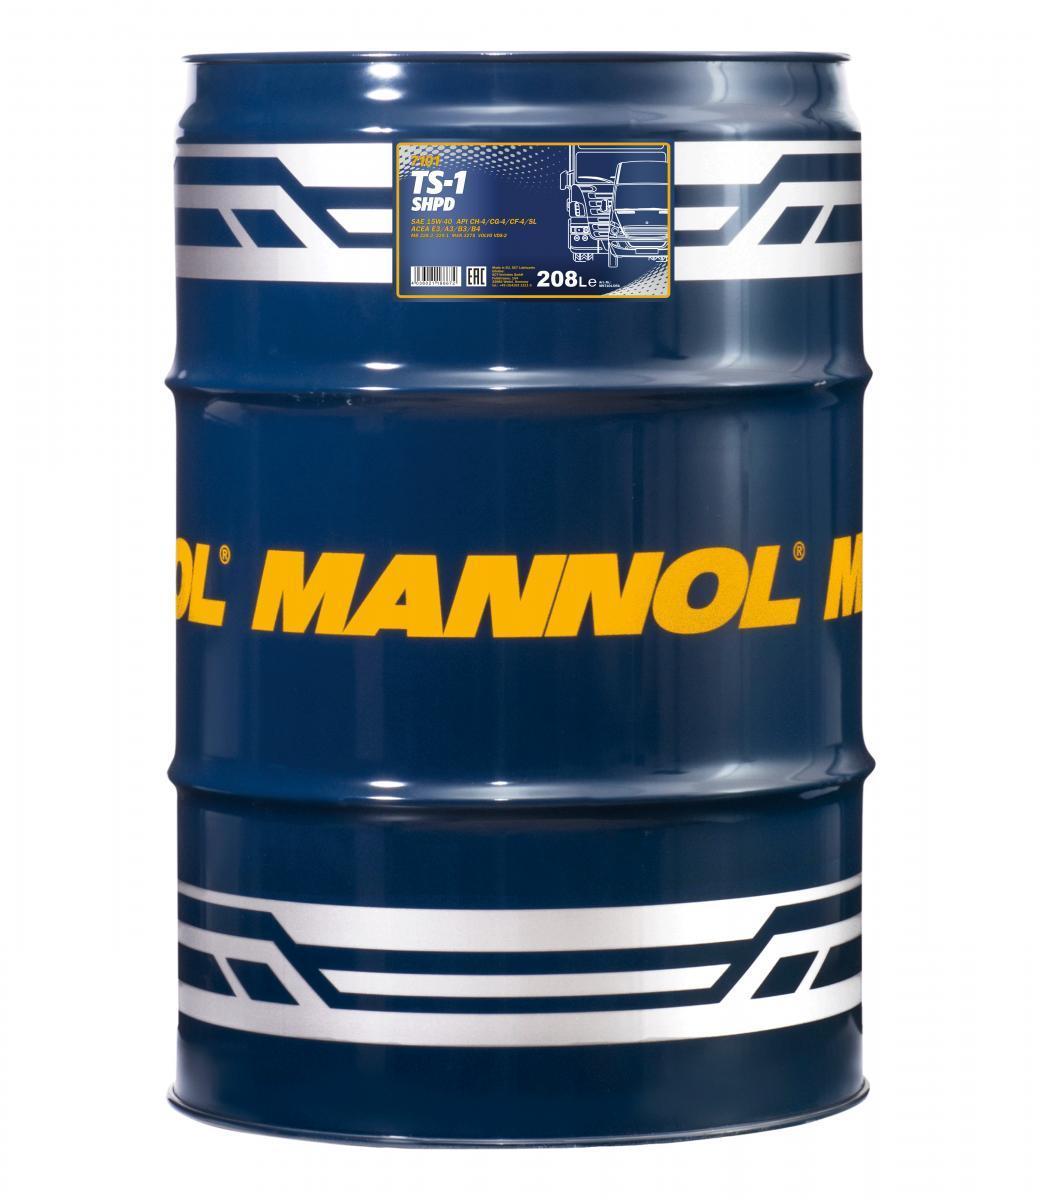 MN7101-DR MANNOL TS-1, SHPD 15W-40, 15W-40, 208l, Mineralöl Motoröl MN7101-DR günstig kaufen